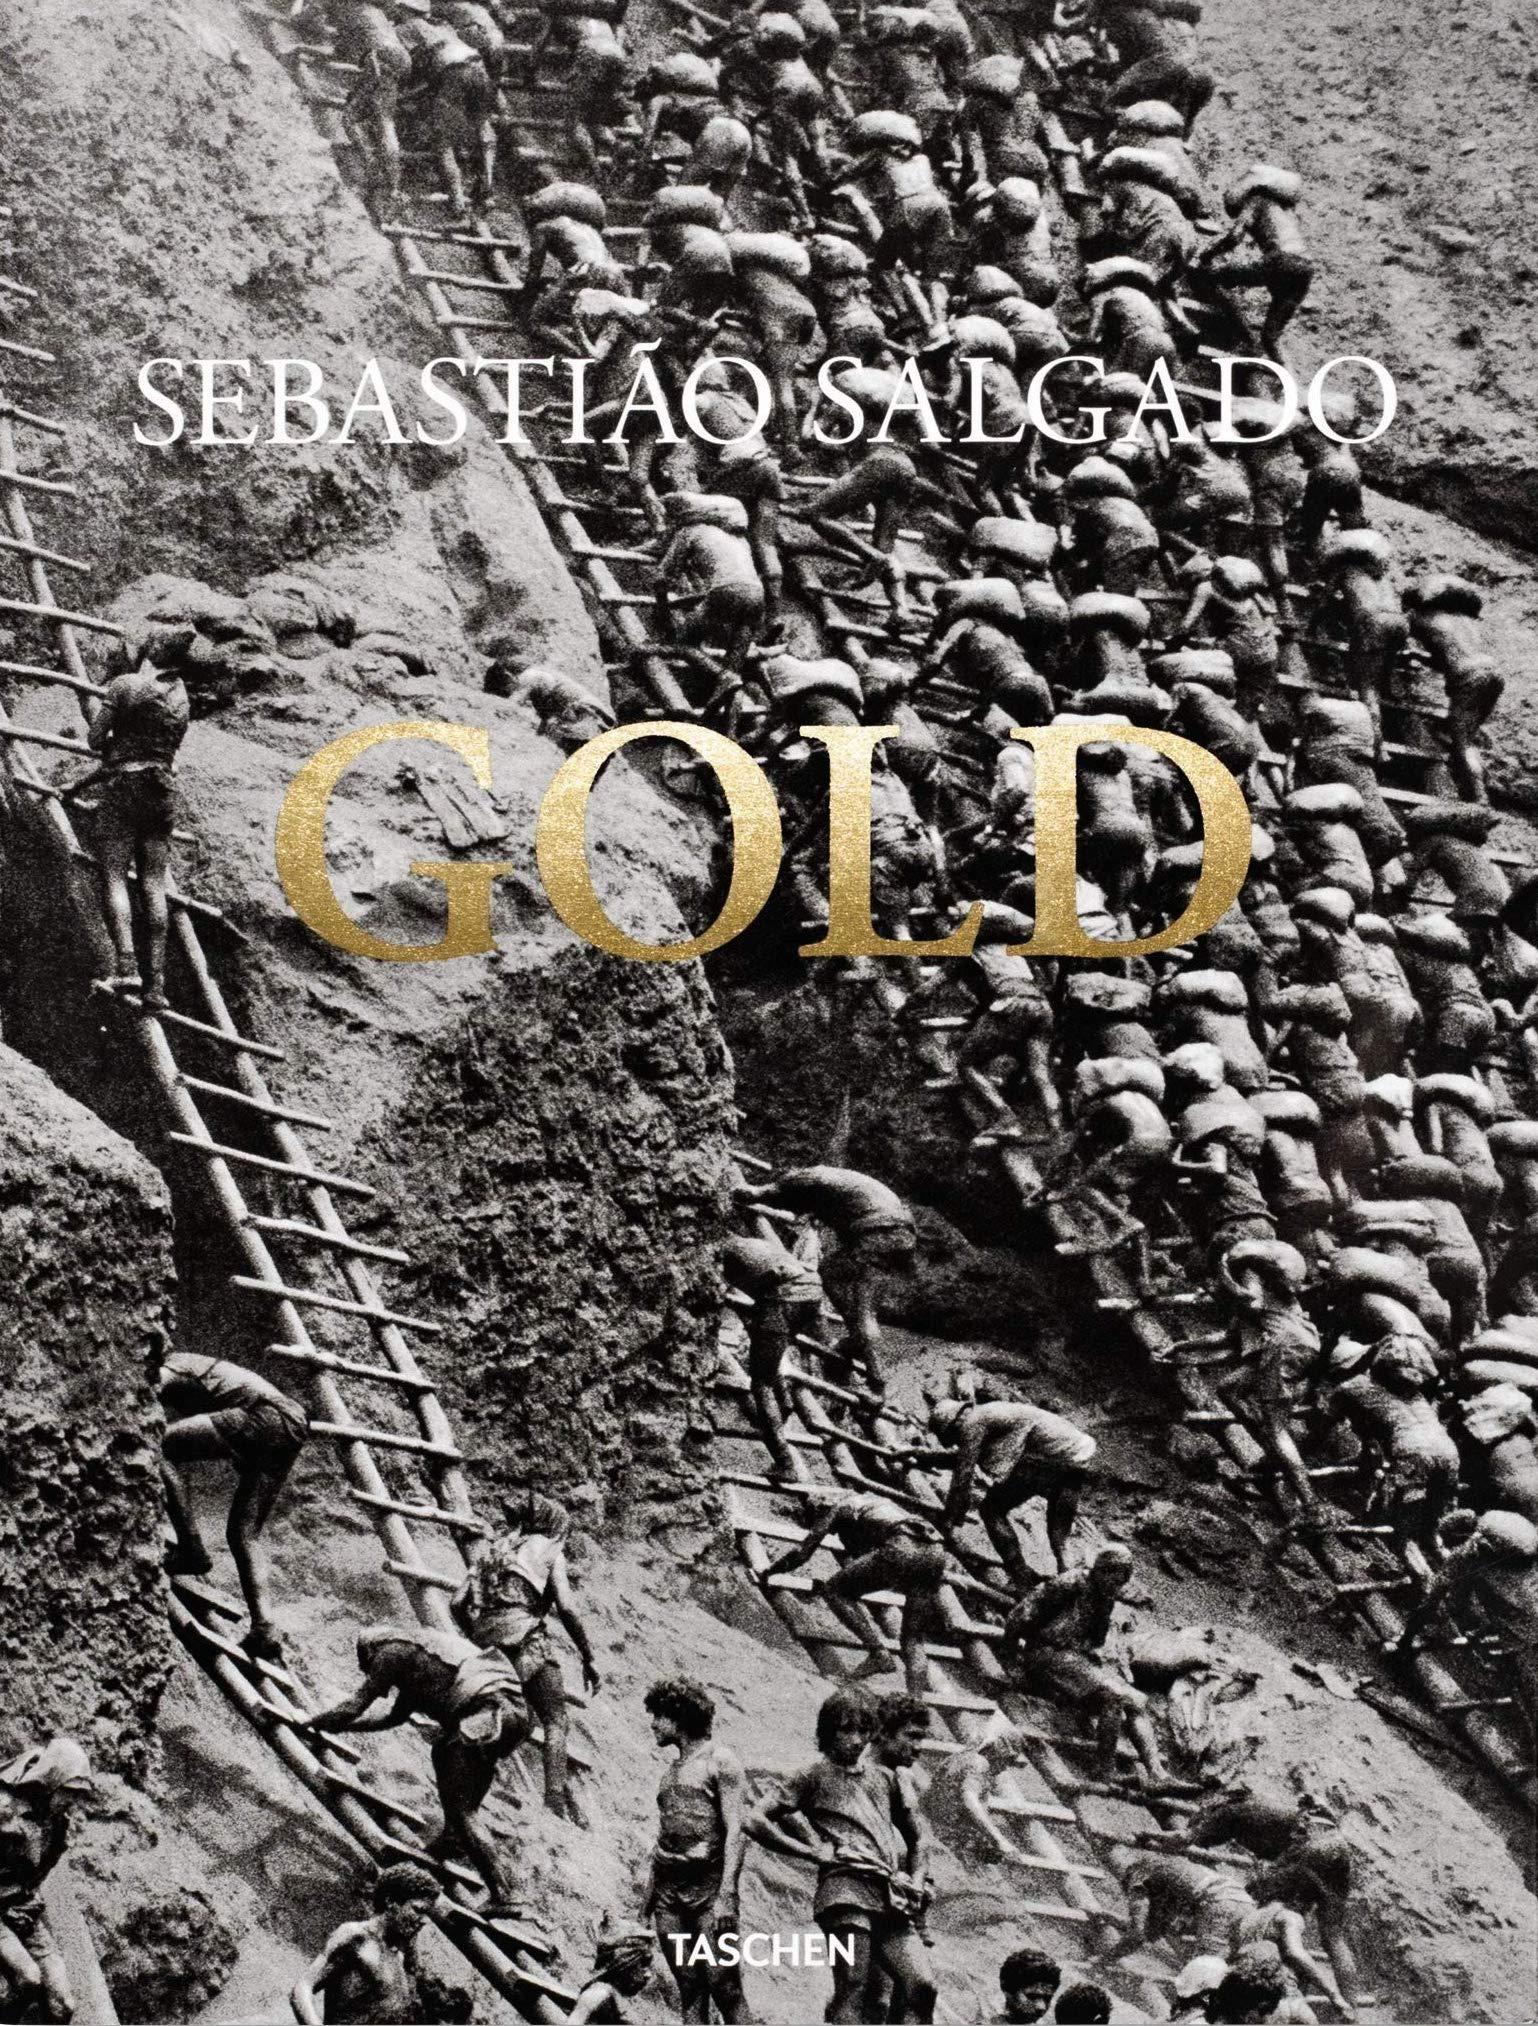 Exposition Gold de Sebastião Salgado à la Polka Galerie jusqu'au 14 mars 2020